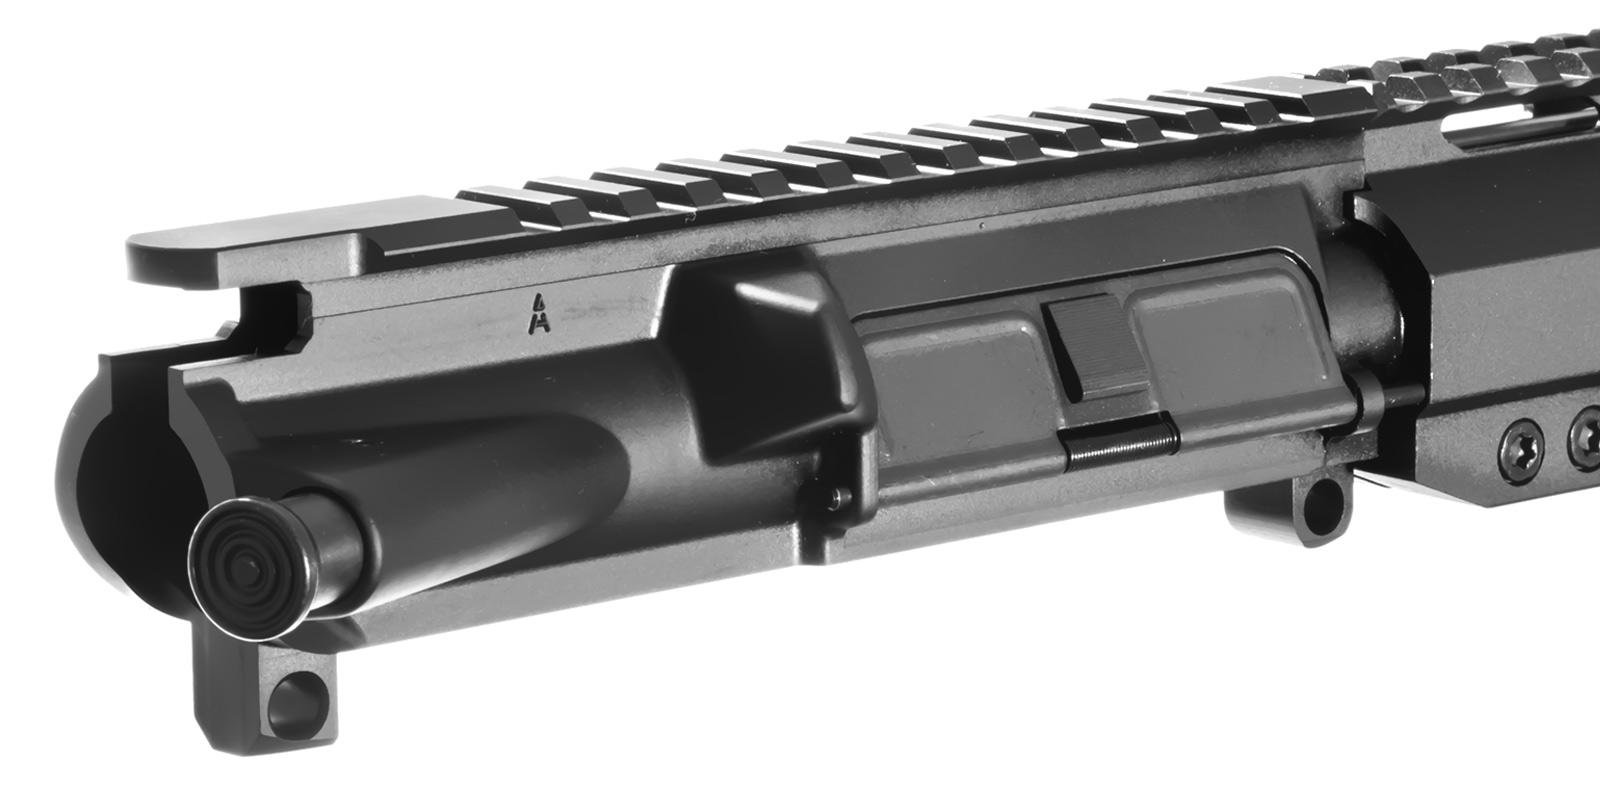 AR15 Upper Assembly – 20 Inches / Bull Barrel / 223 WYLDE / 160007